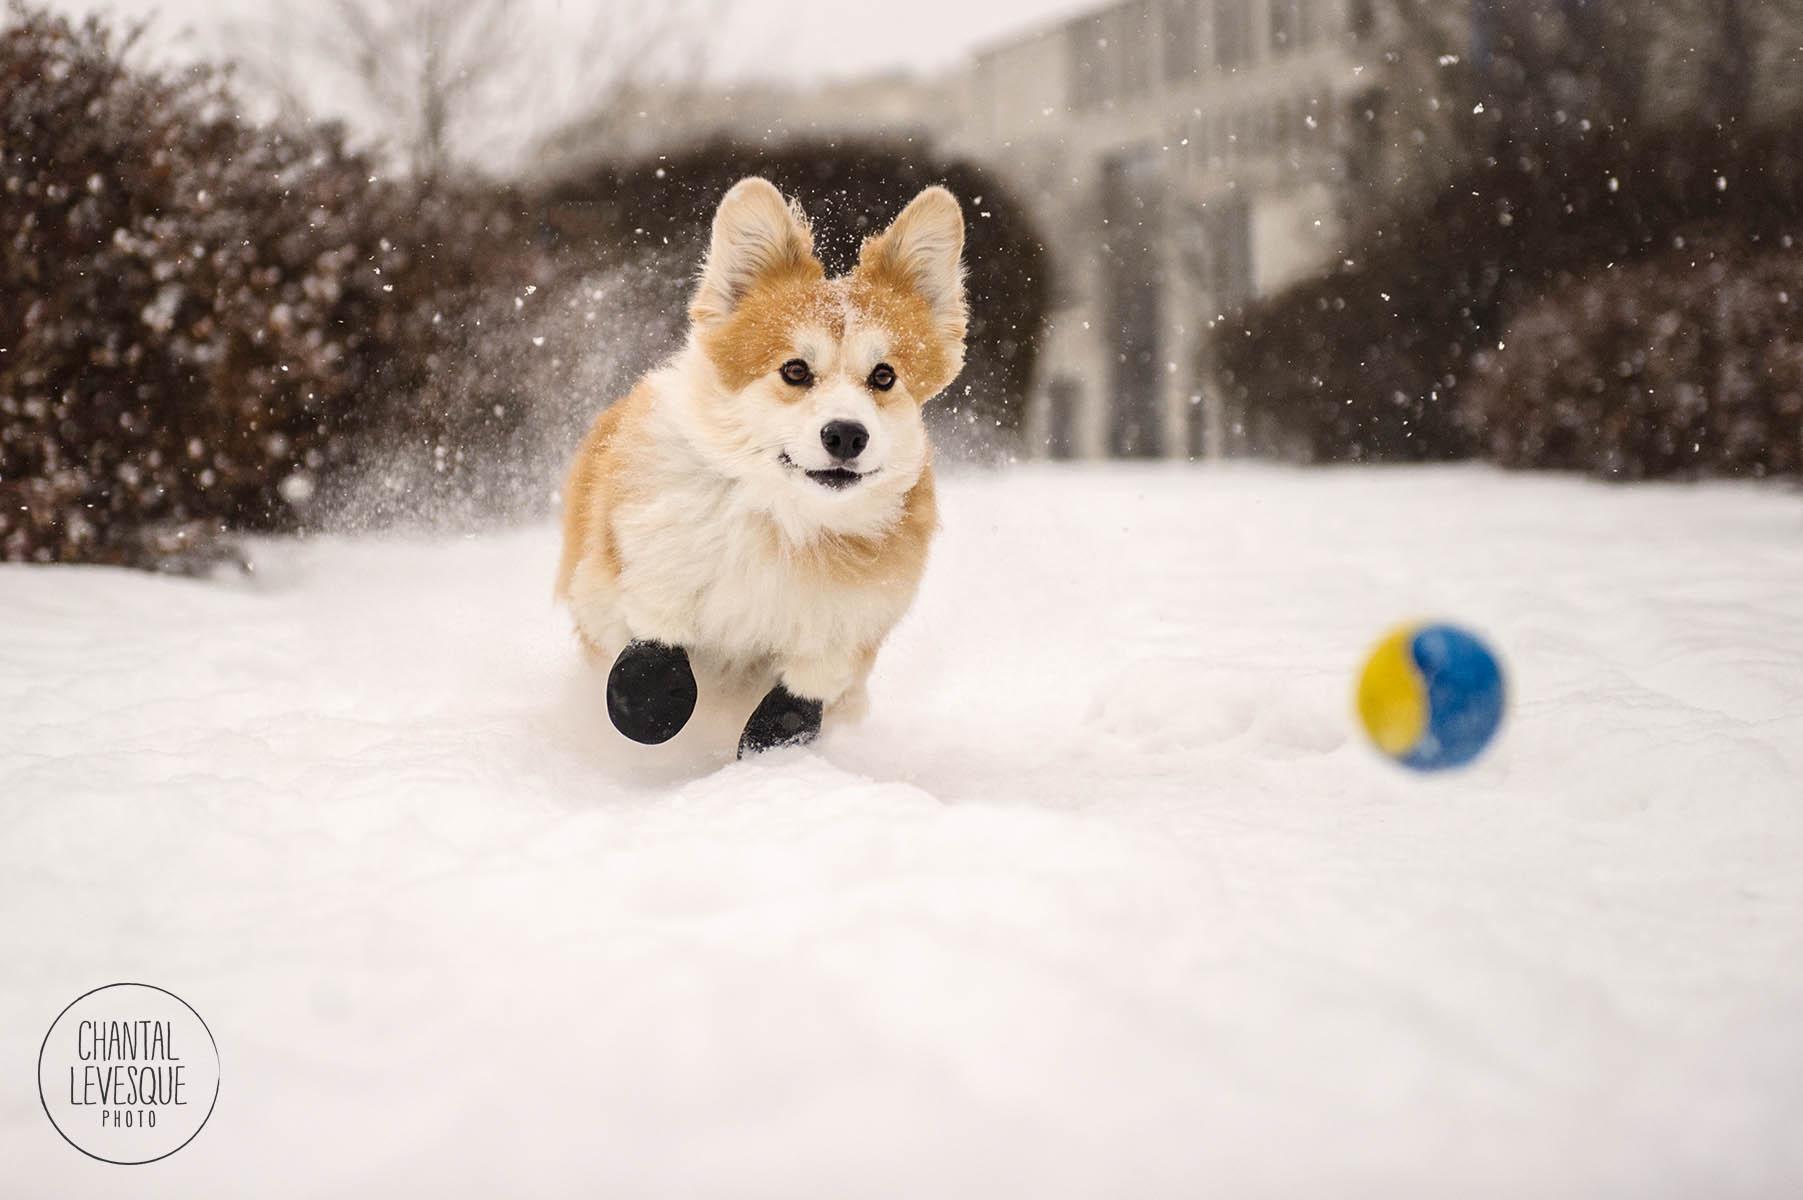 corgi-play-ball-snow